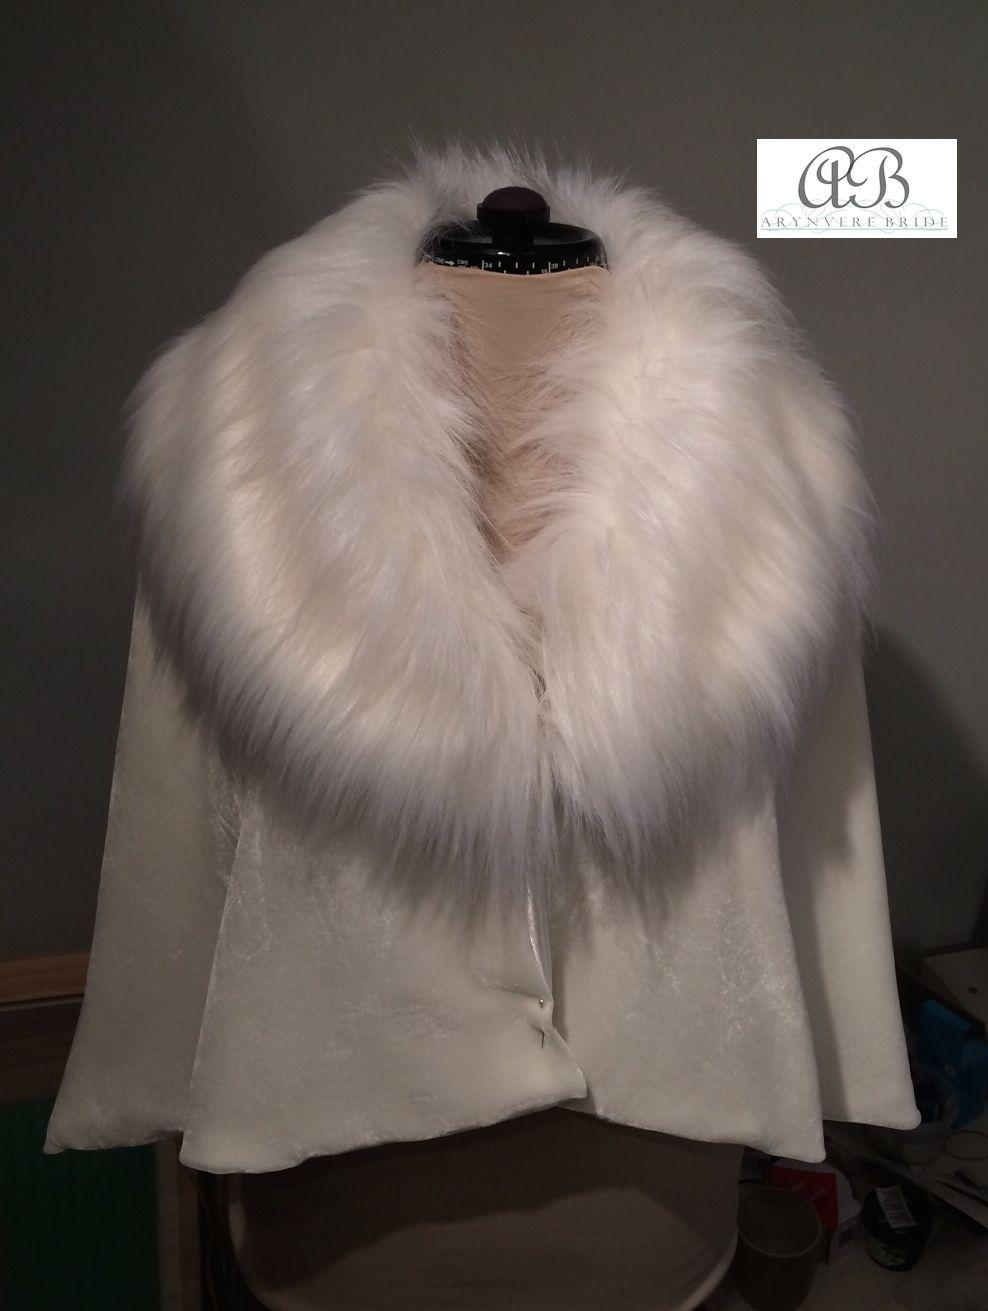 Silk Velvet Cape, Faux Fur Collar, fully lined in bridal satin.  Arynvere Bride www.arynverebride.com #bride #fauxfur #cape #wedding #winterwedding